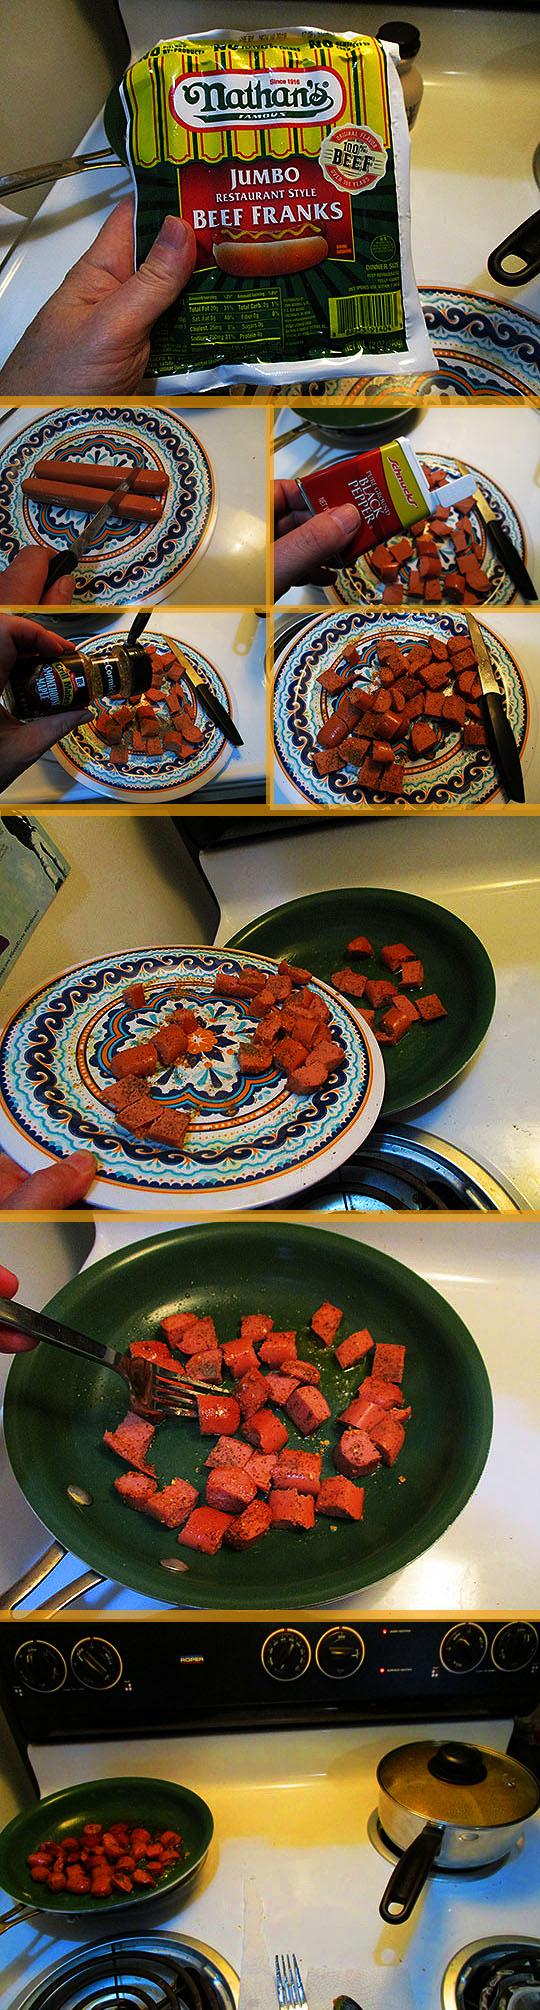 6. hotdogs_8-8-19.jpg